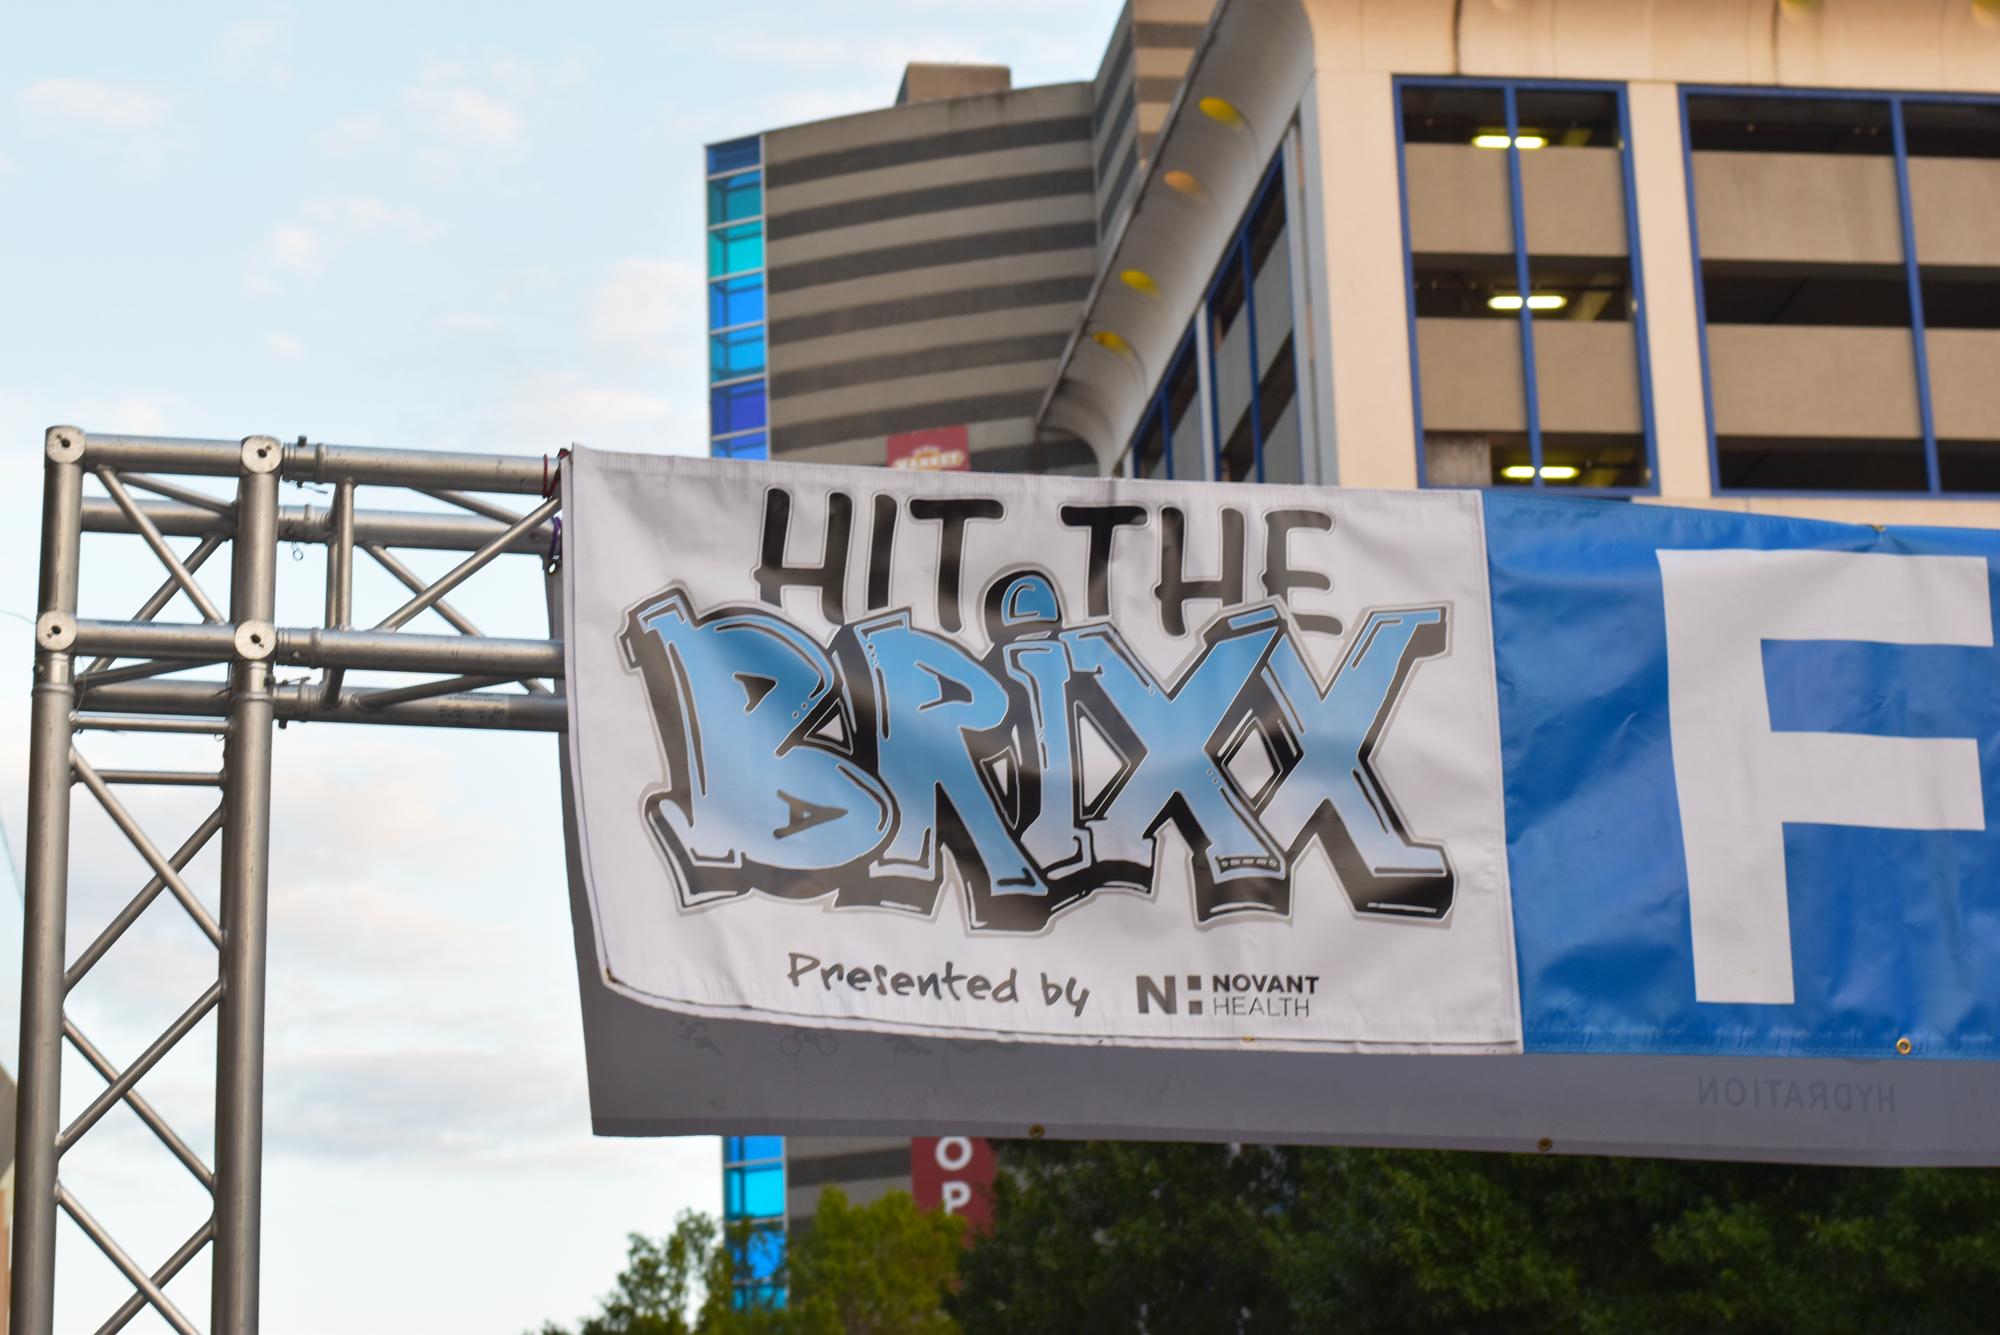 Hit the Brixx 15k